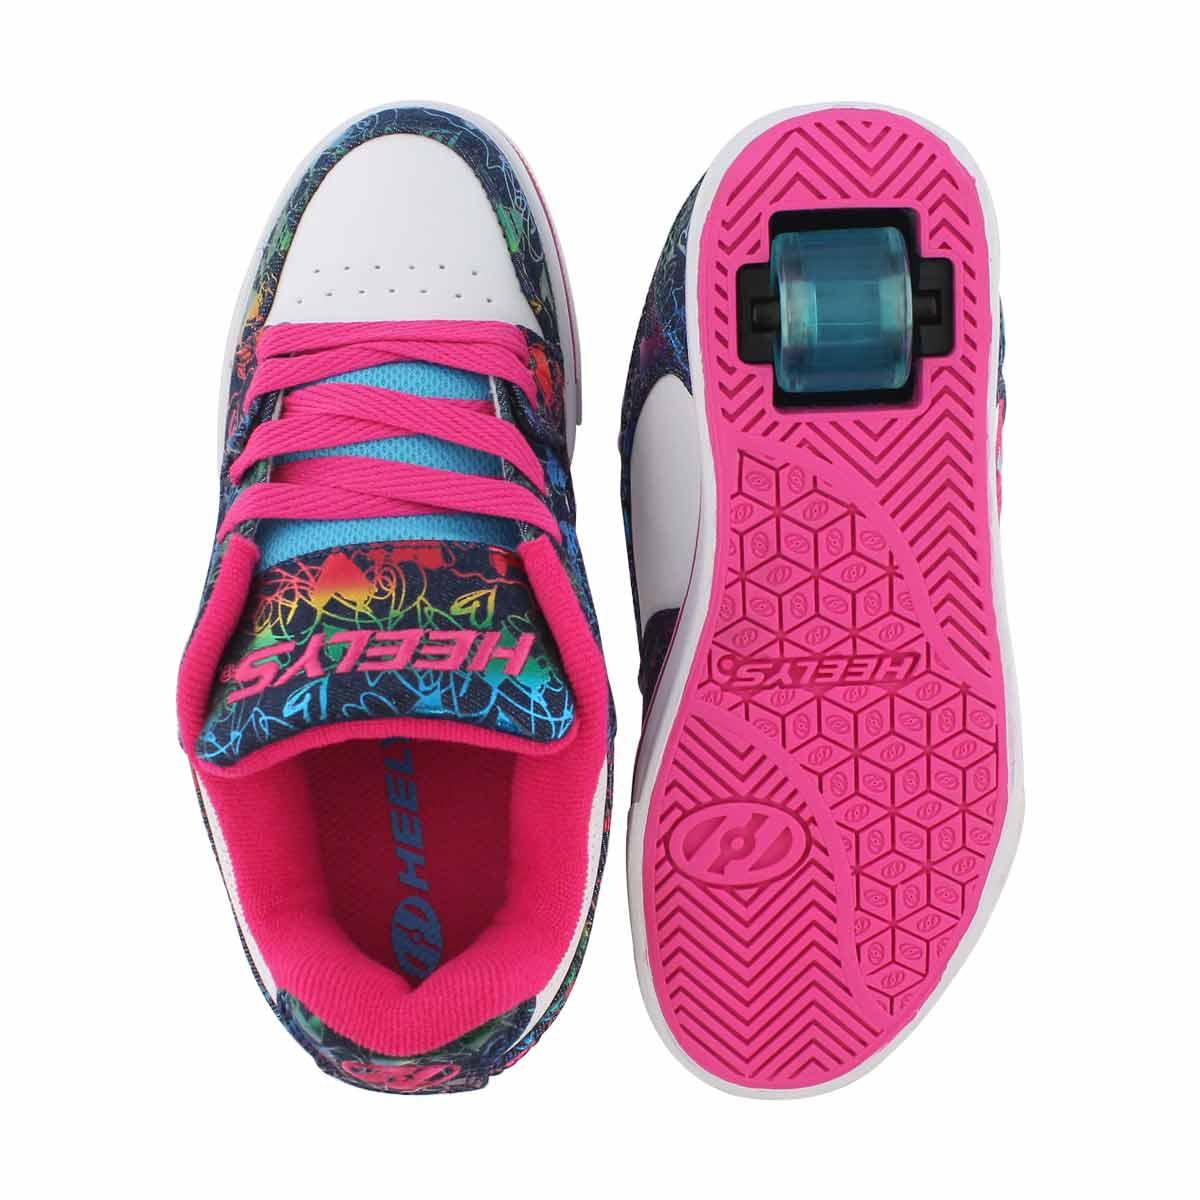 Grls Motion Plus wht/mlti skate sneaker